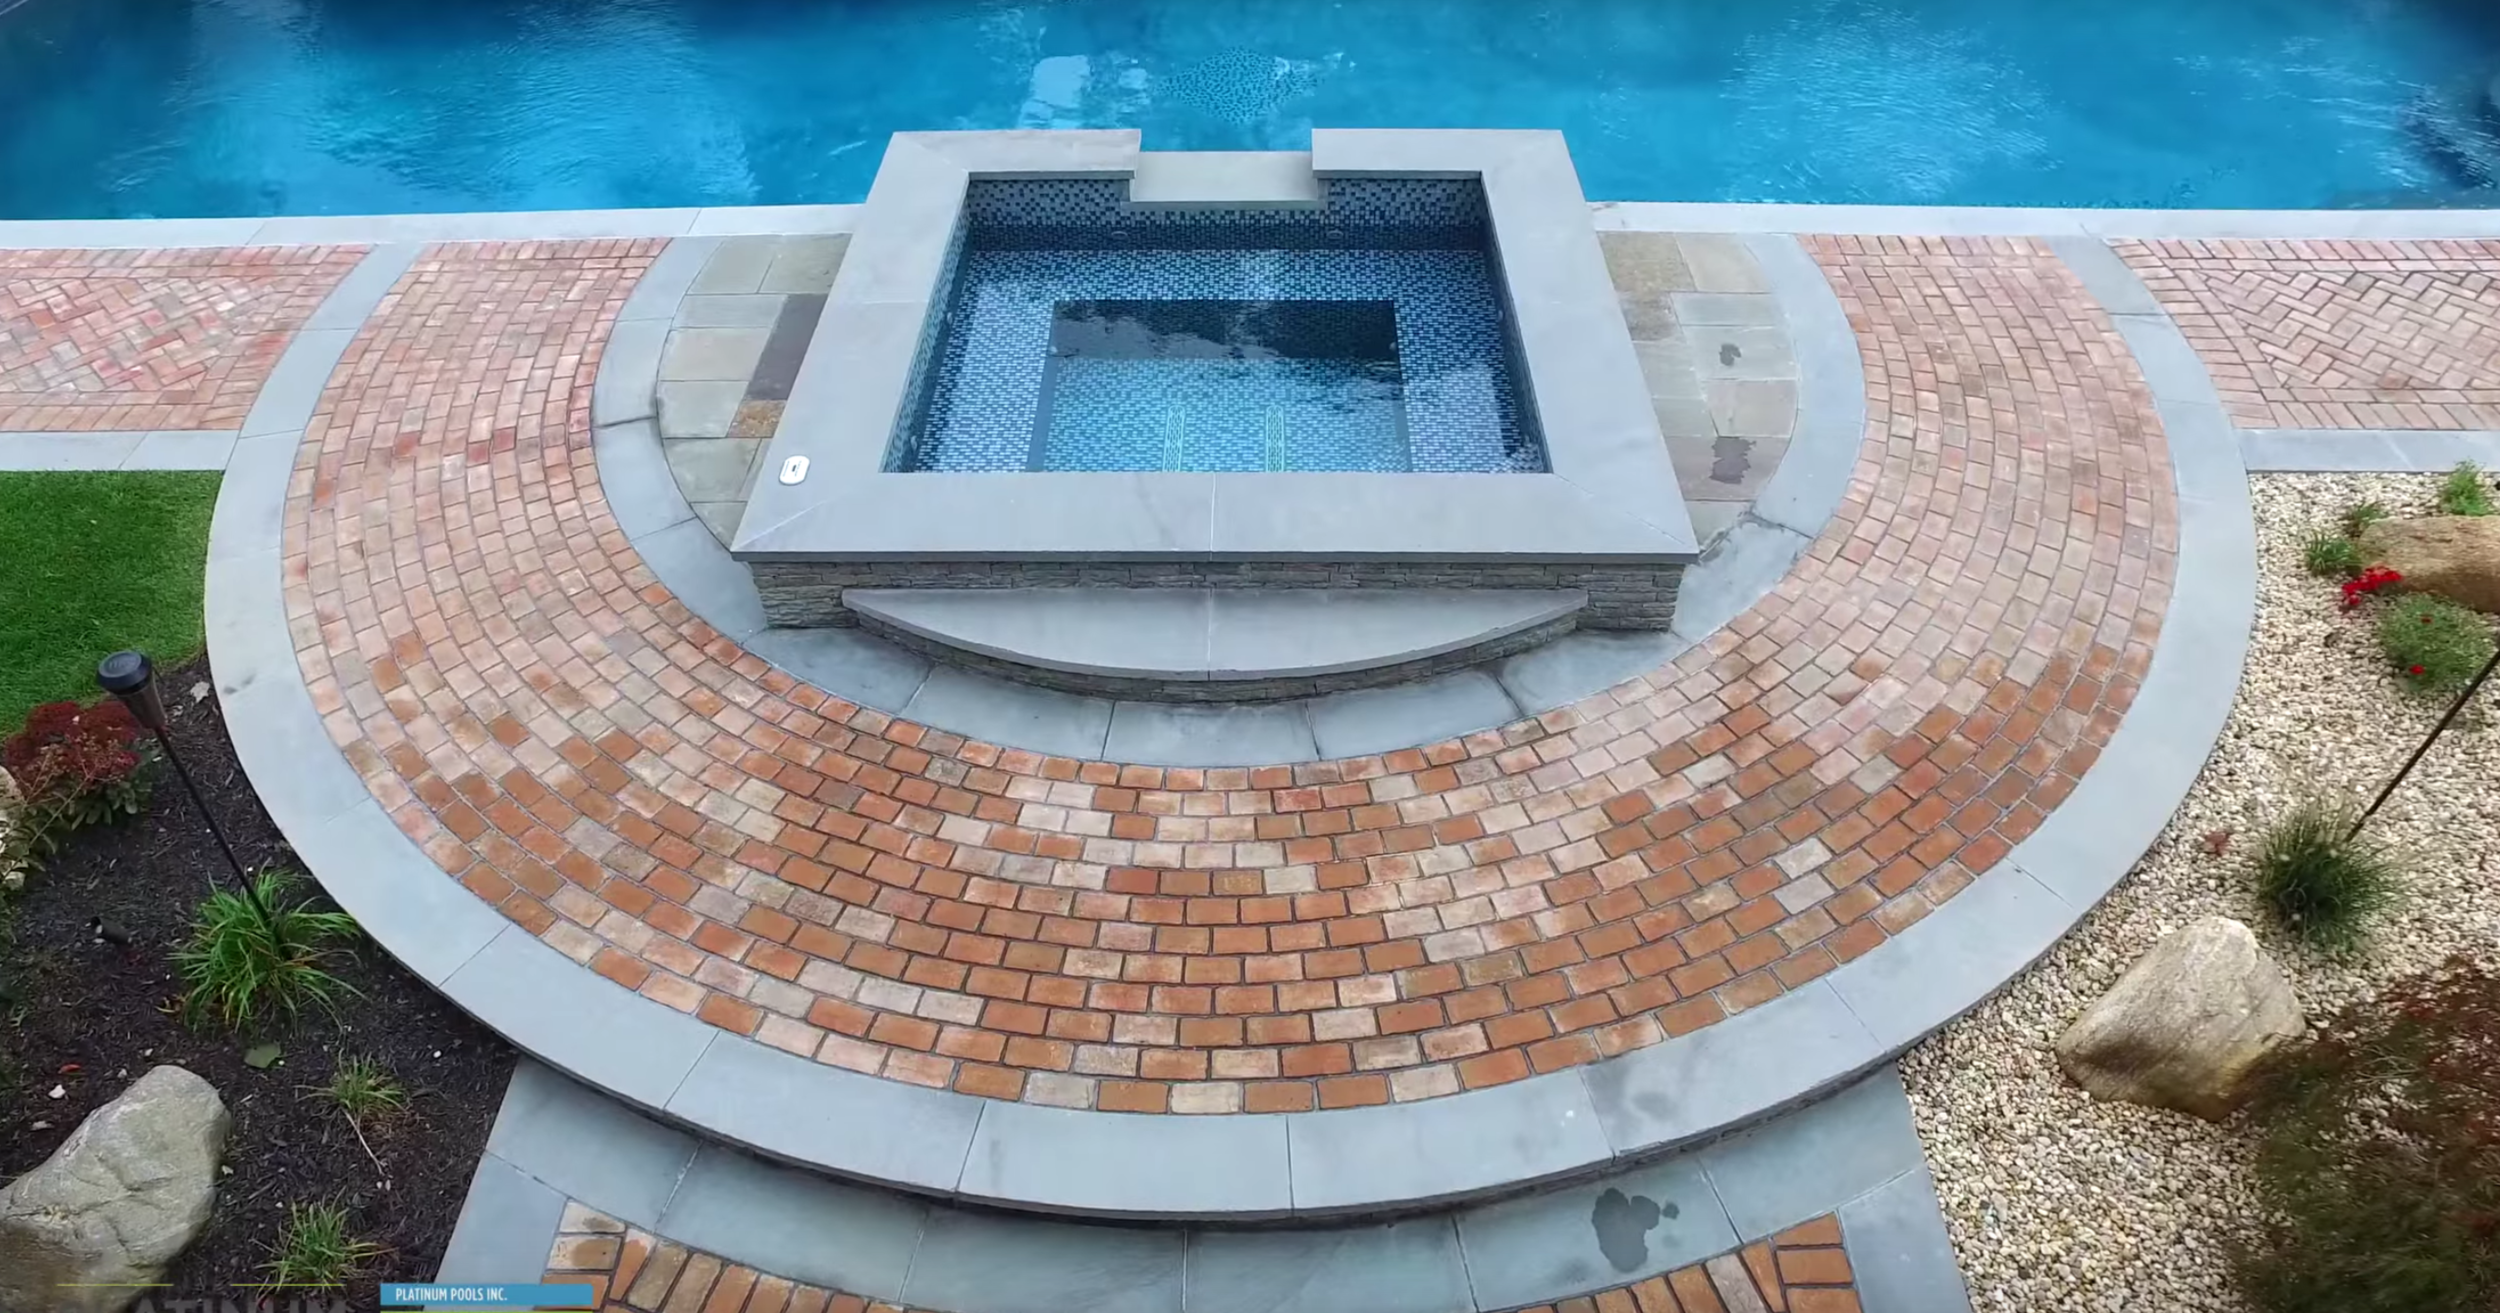 Masonry craftsmen and gunite pool builder in Glen Cove, NY